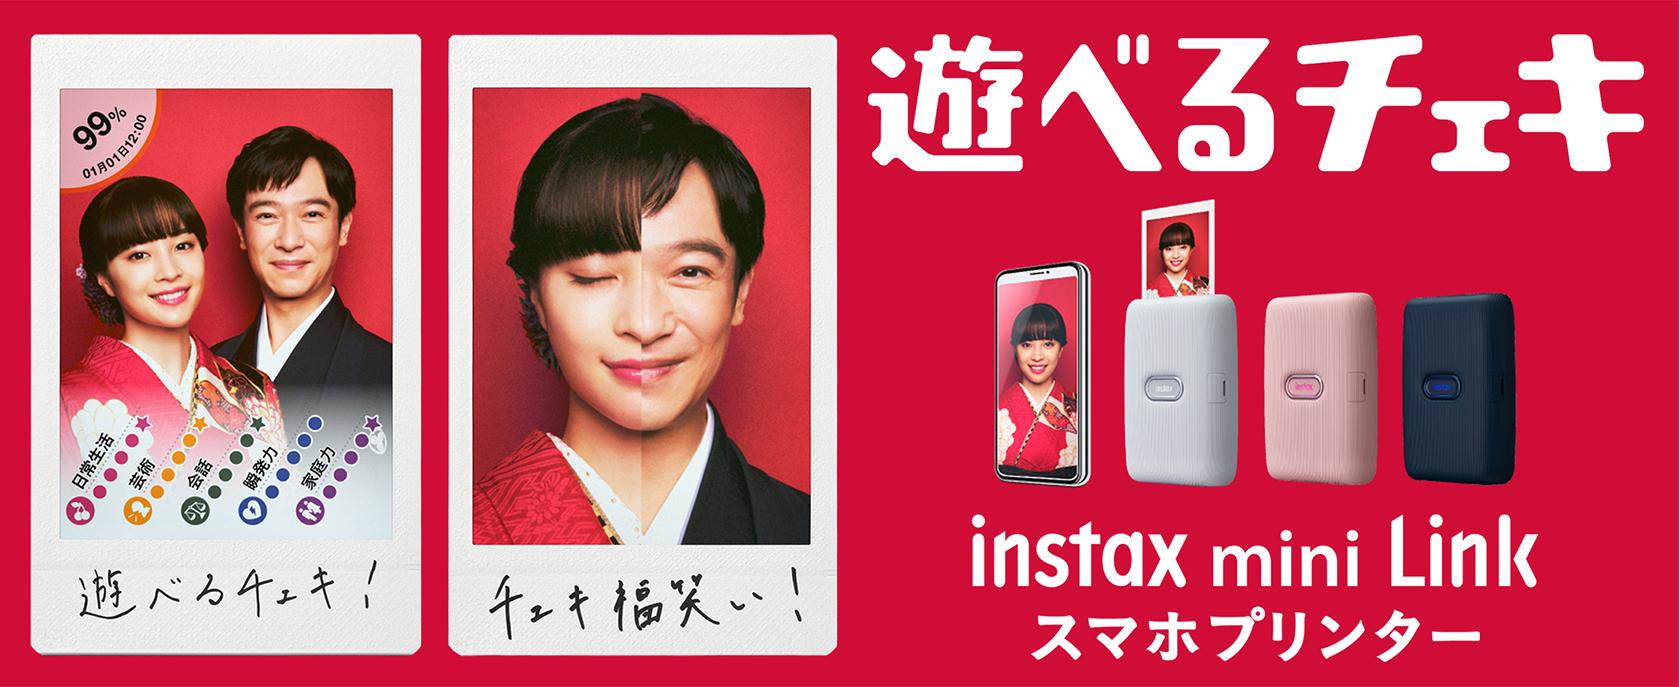 [画像]instax mini Link